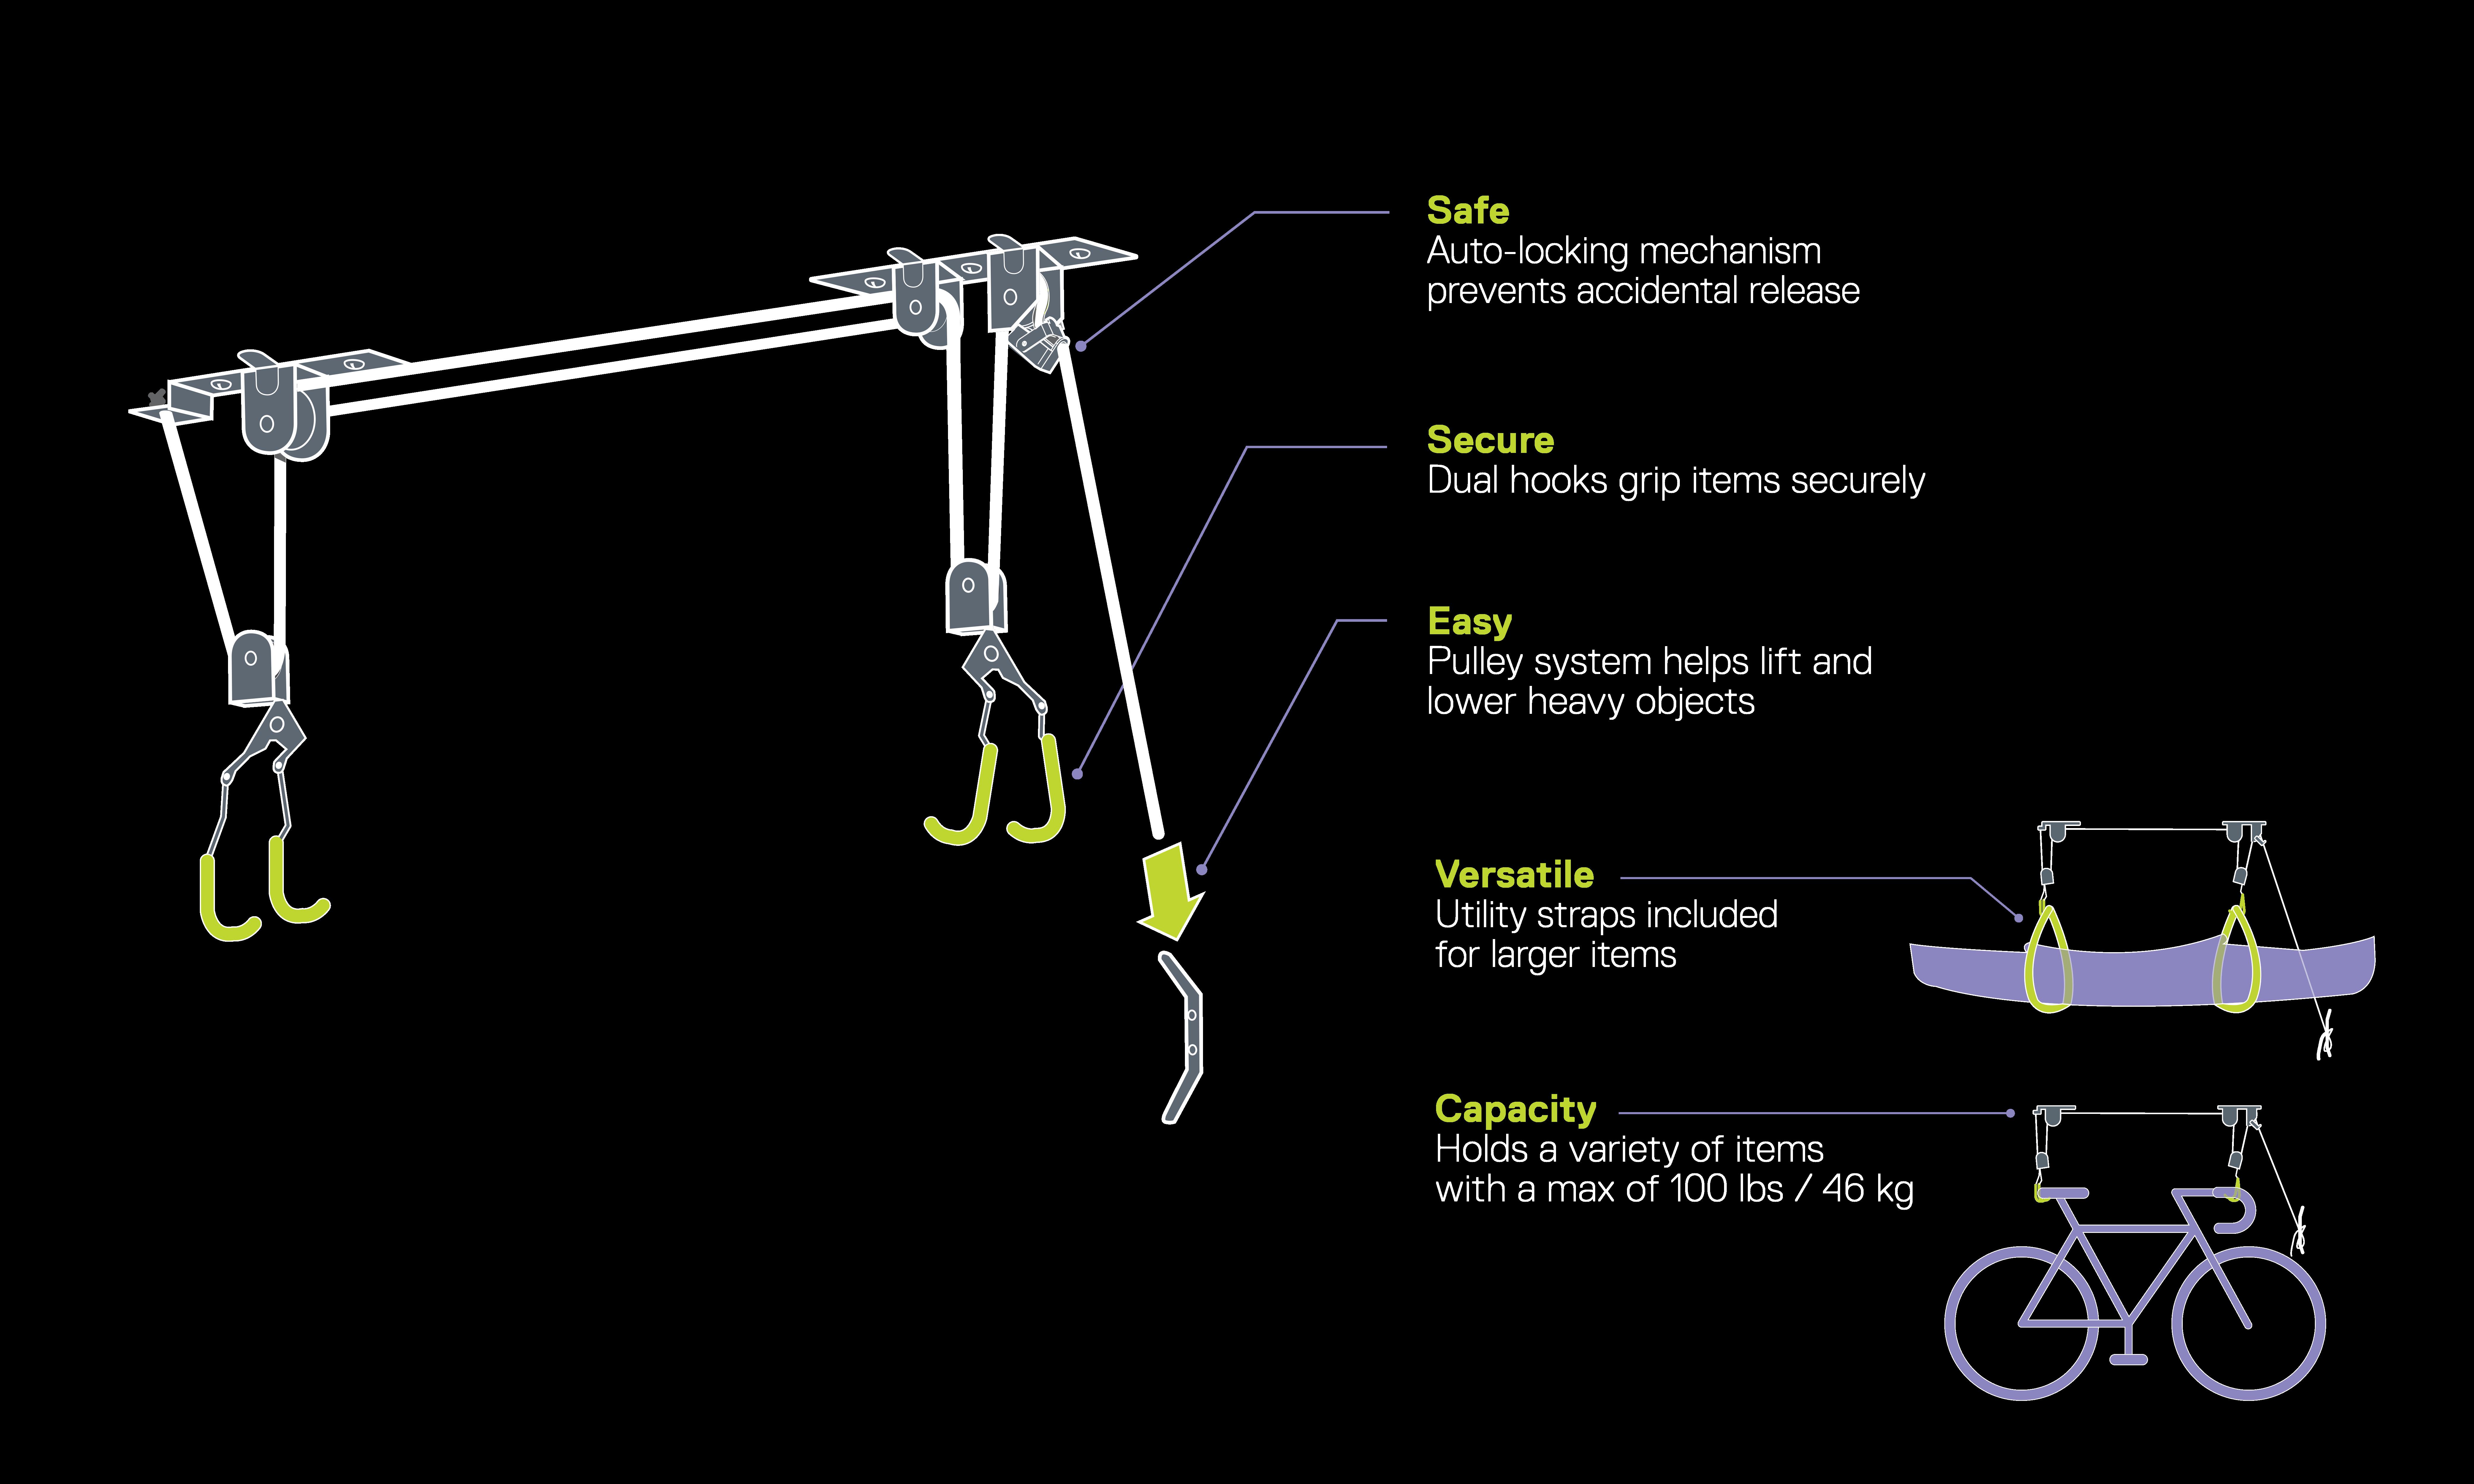 Single Bike Ceiling Hoist with Straps diagram